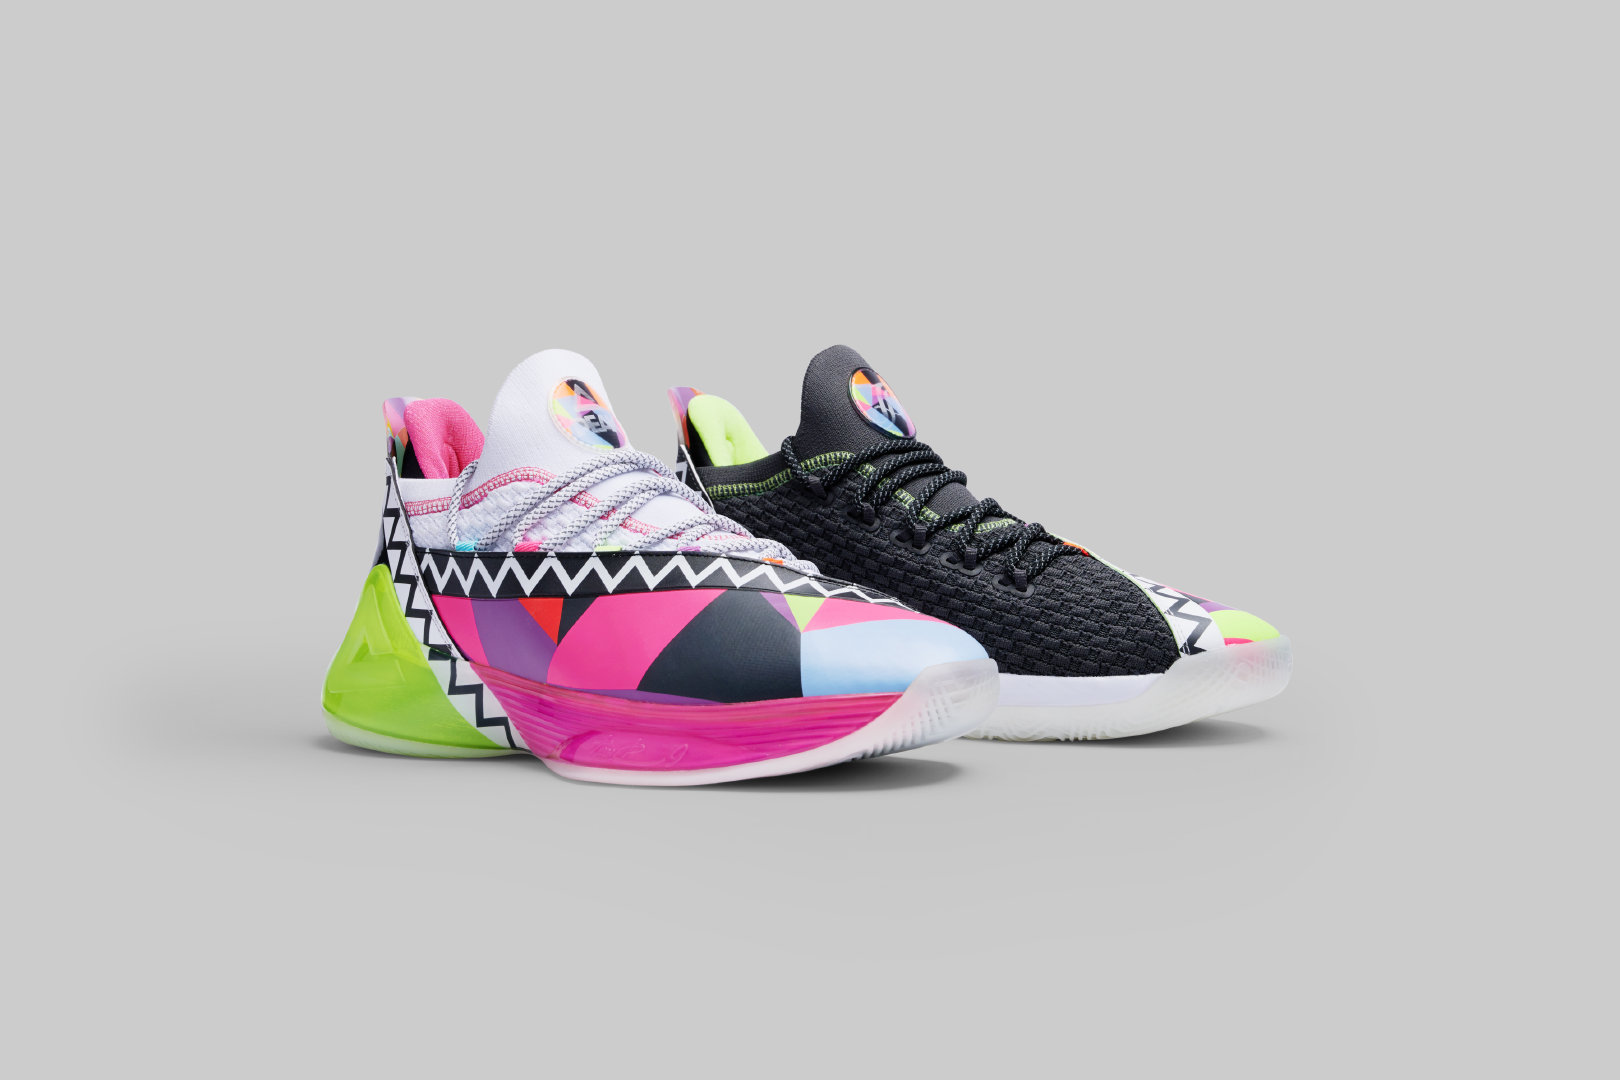 sneaker_20190728151104_22.jpg